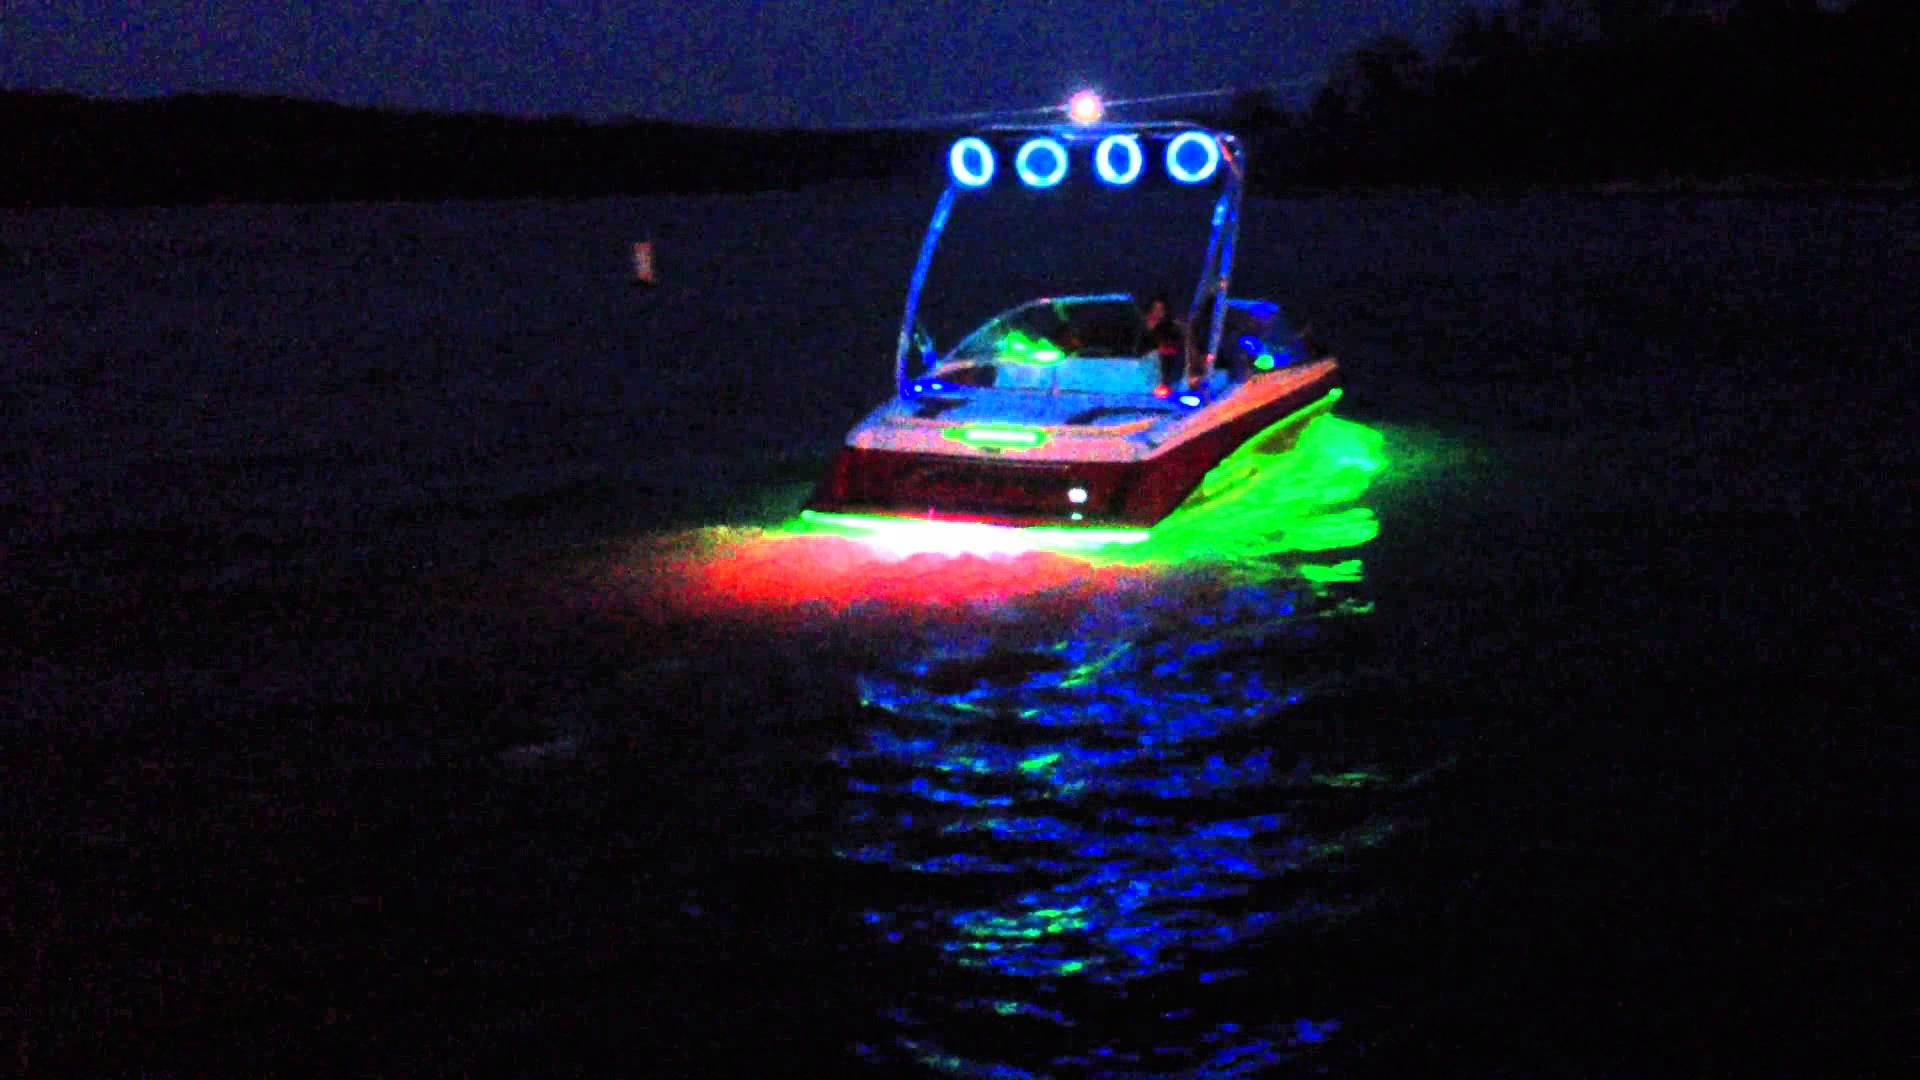 Legit LED Fully Custom Boat in RGB - YouTube